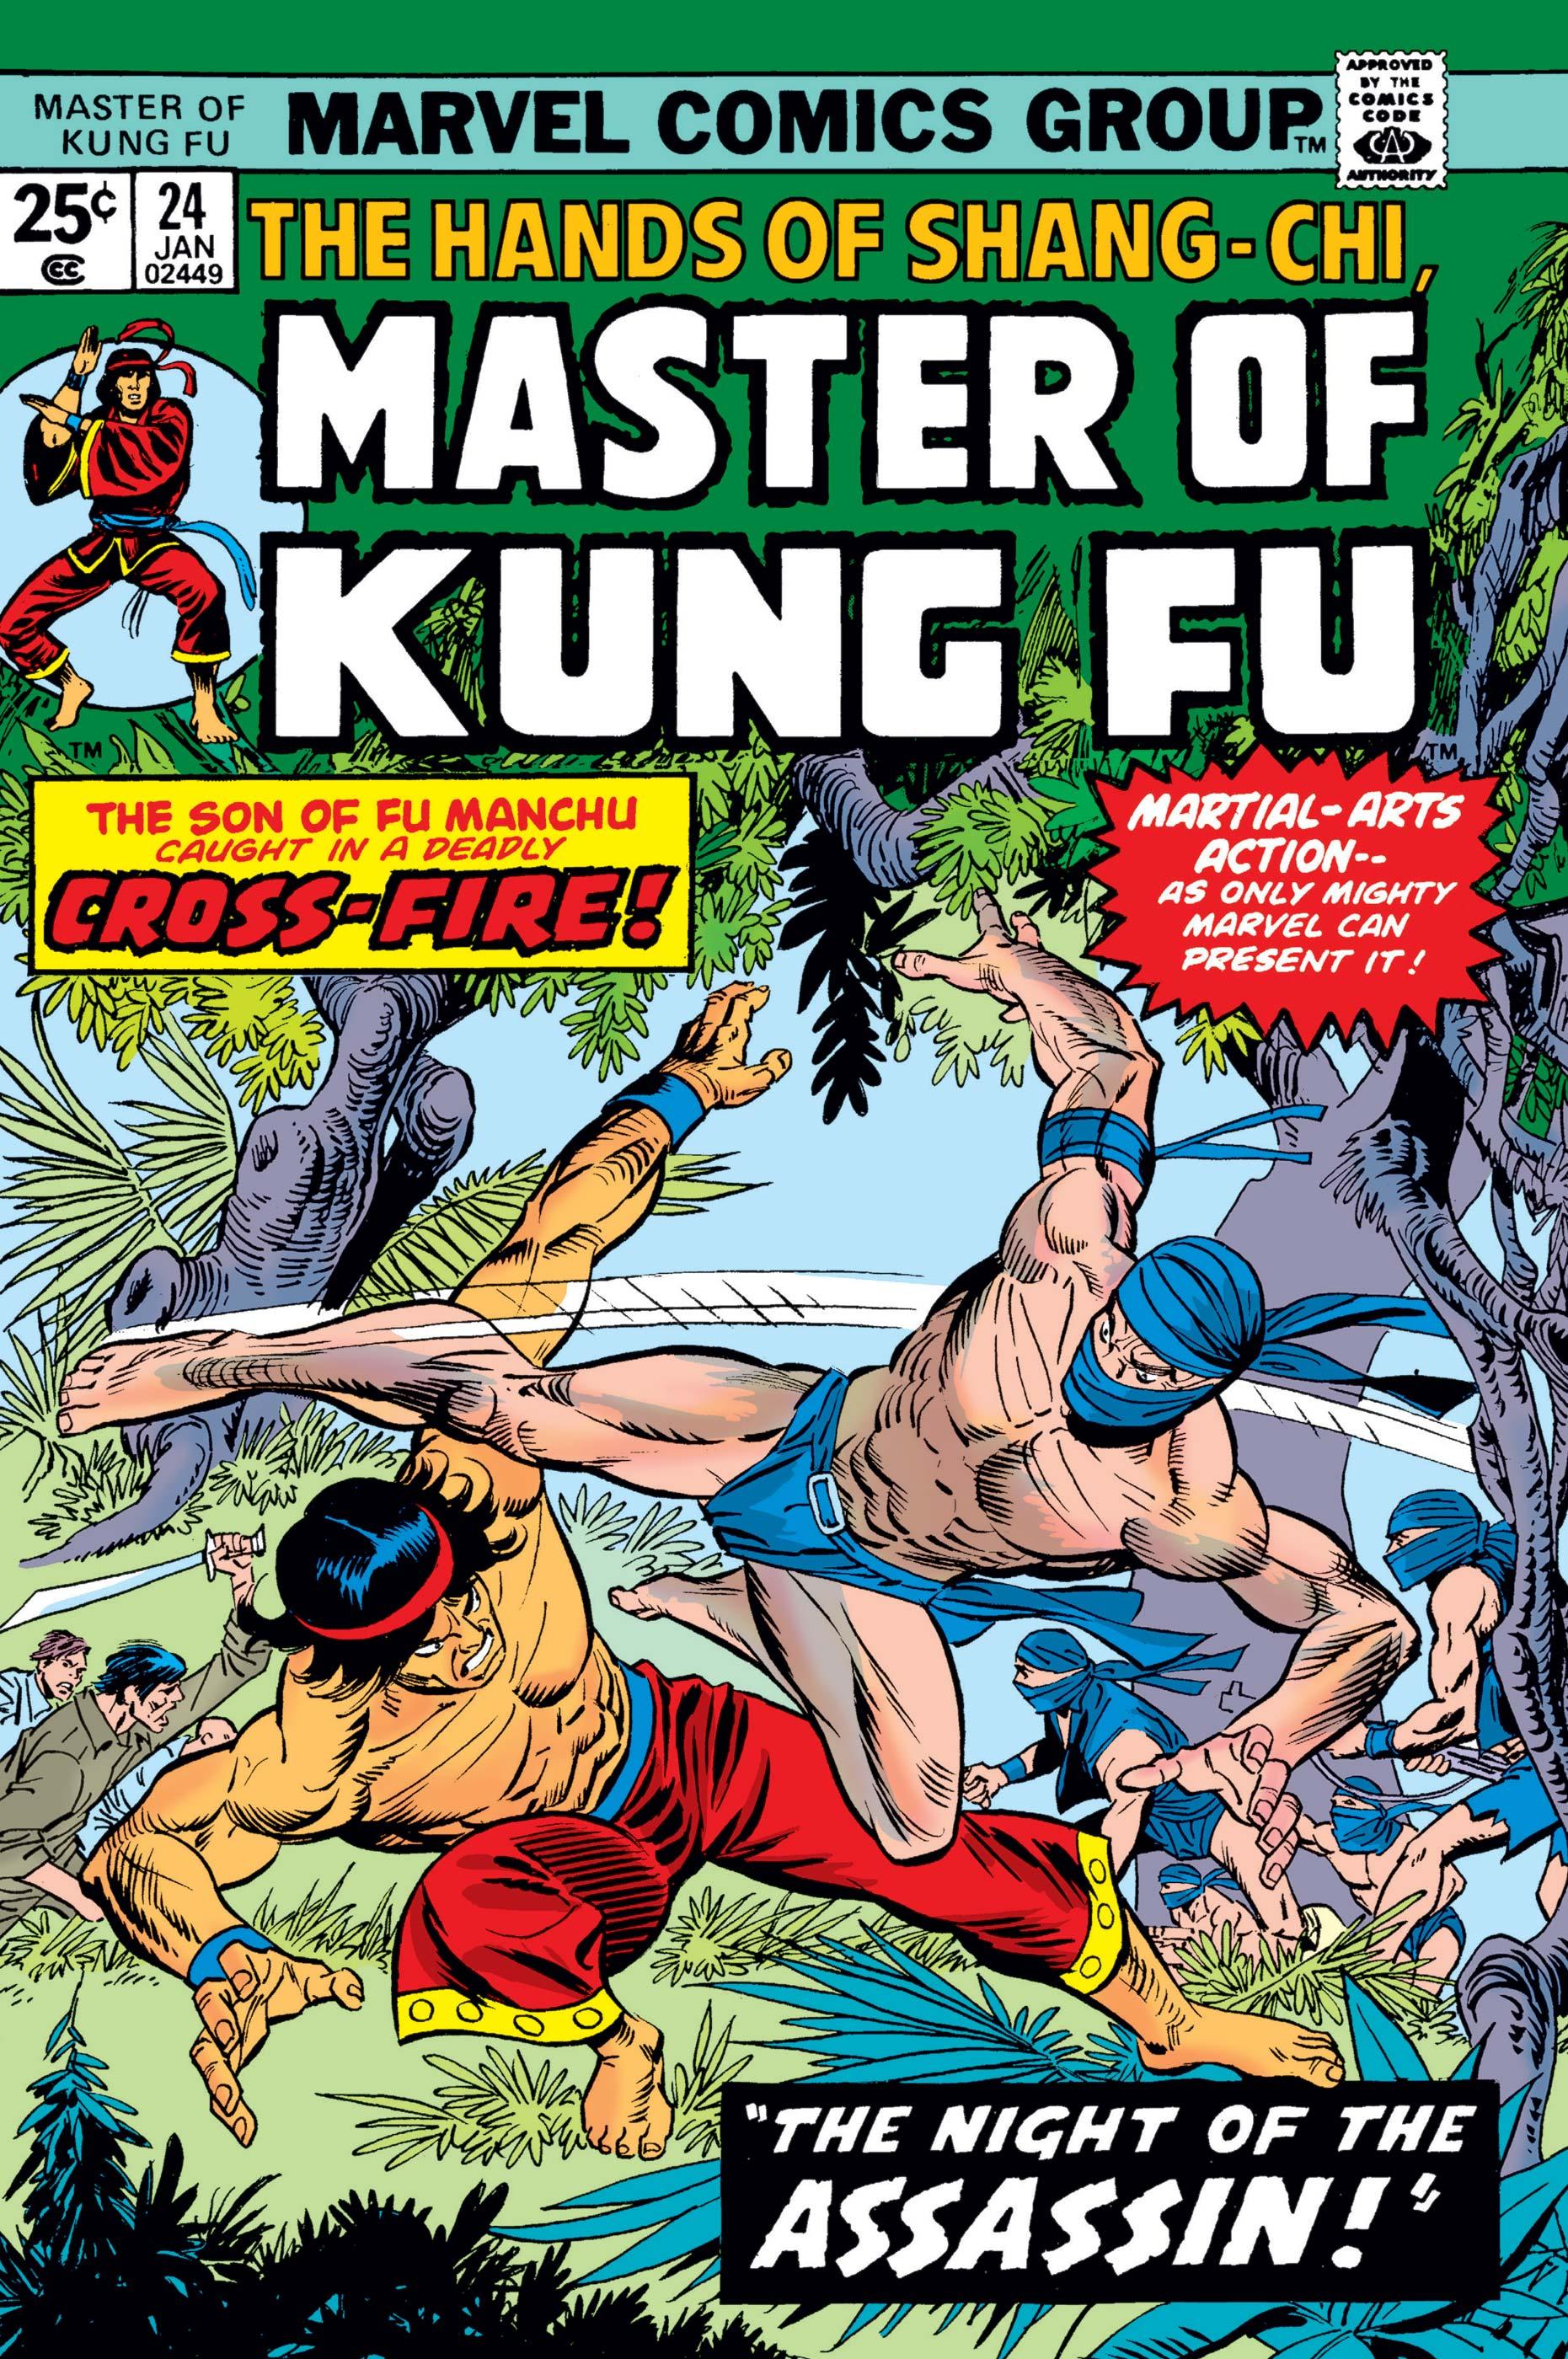 Master of Kung Fu (1974) #24